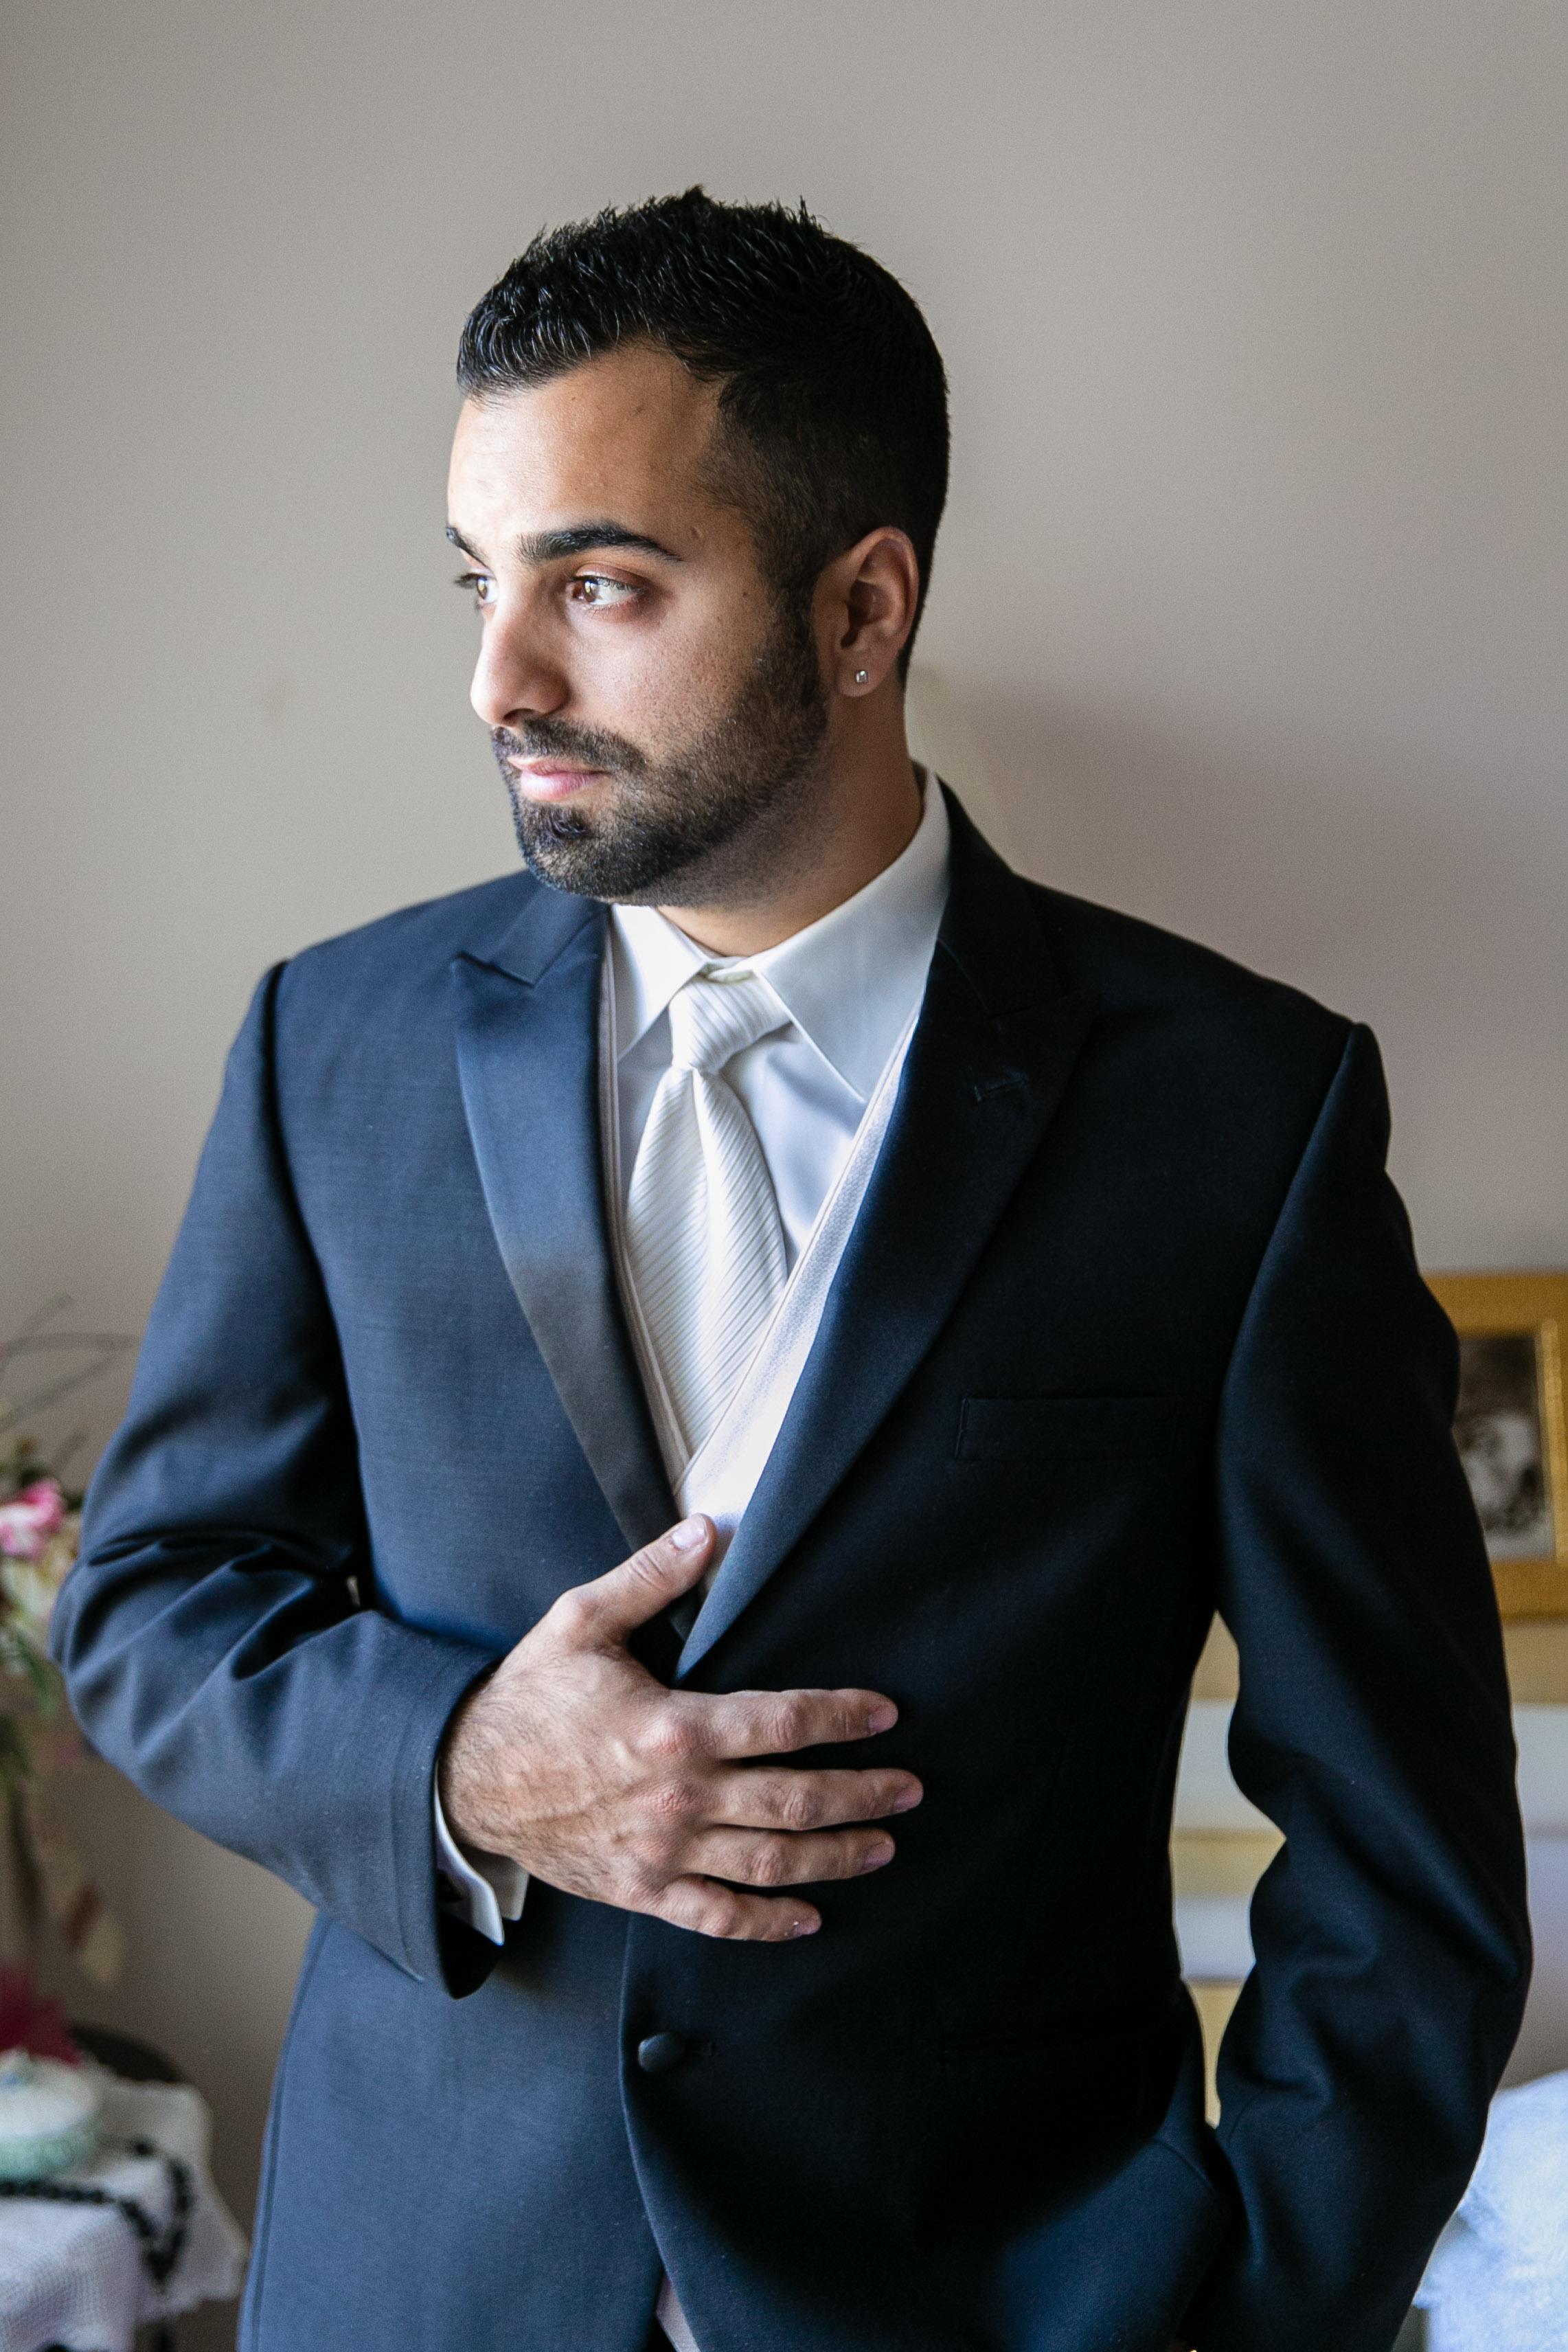 Greek-Wedding-Hartford-La-Notte-Restaurant-Connecticut-Documentary-Wedding-Photography-by-Jacek-Dolata-3.jpg